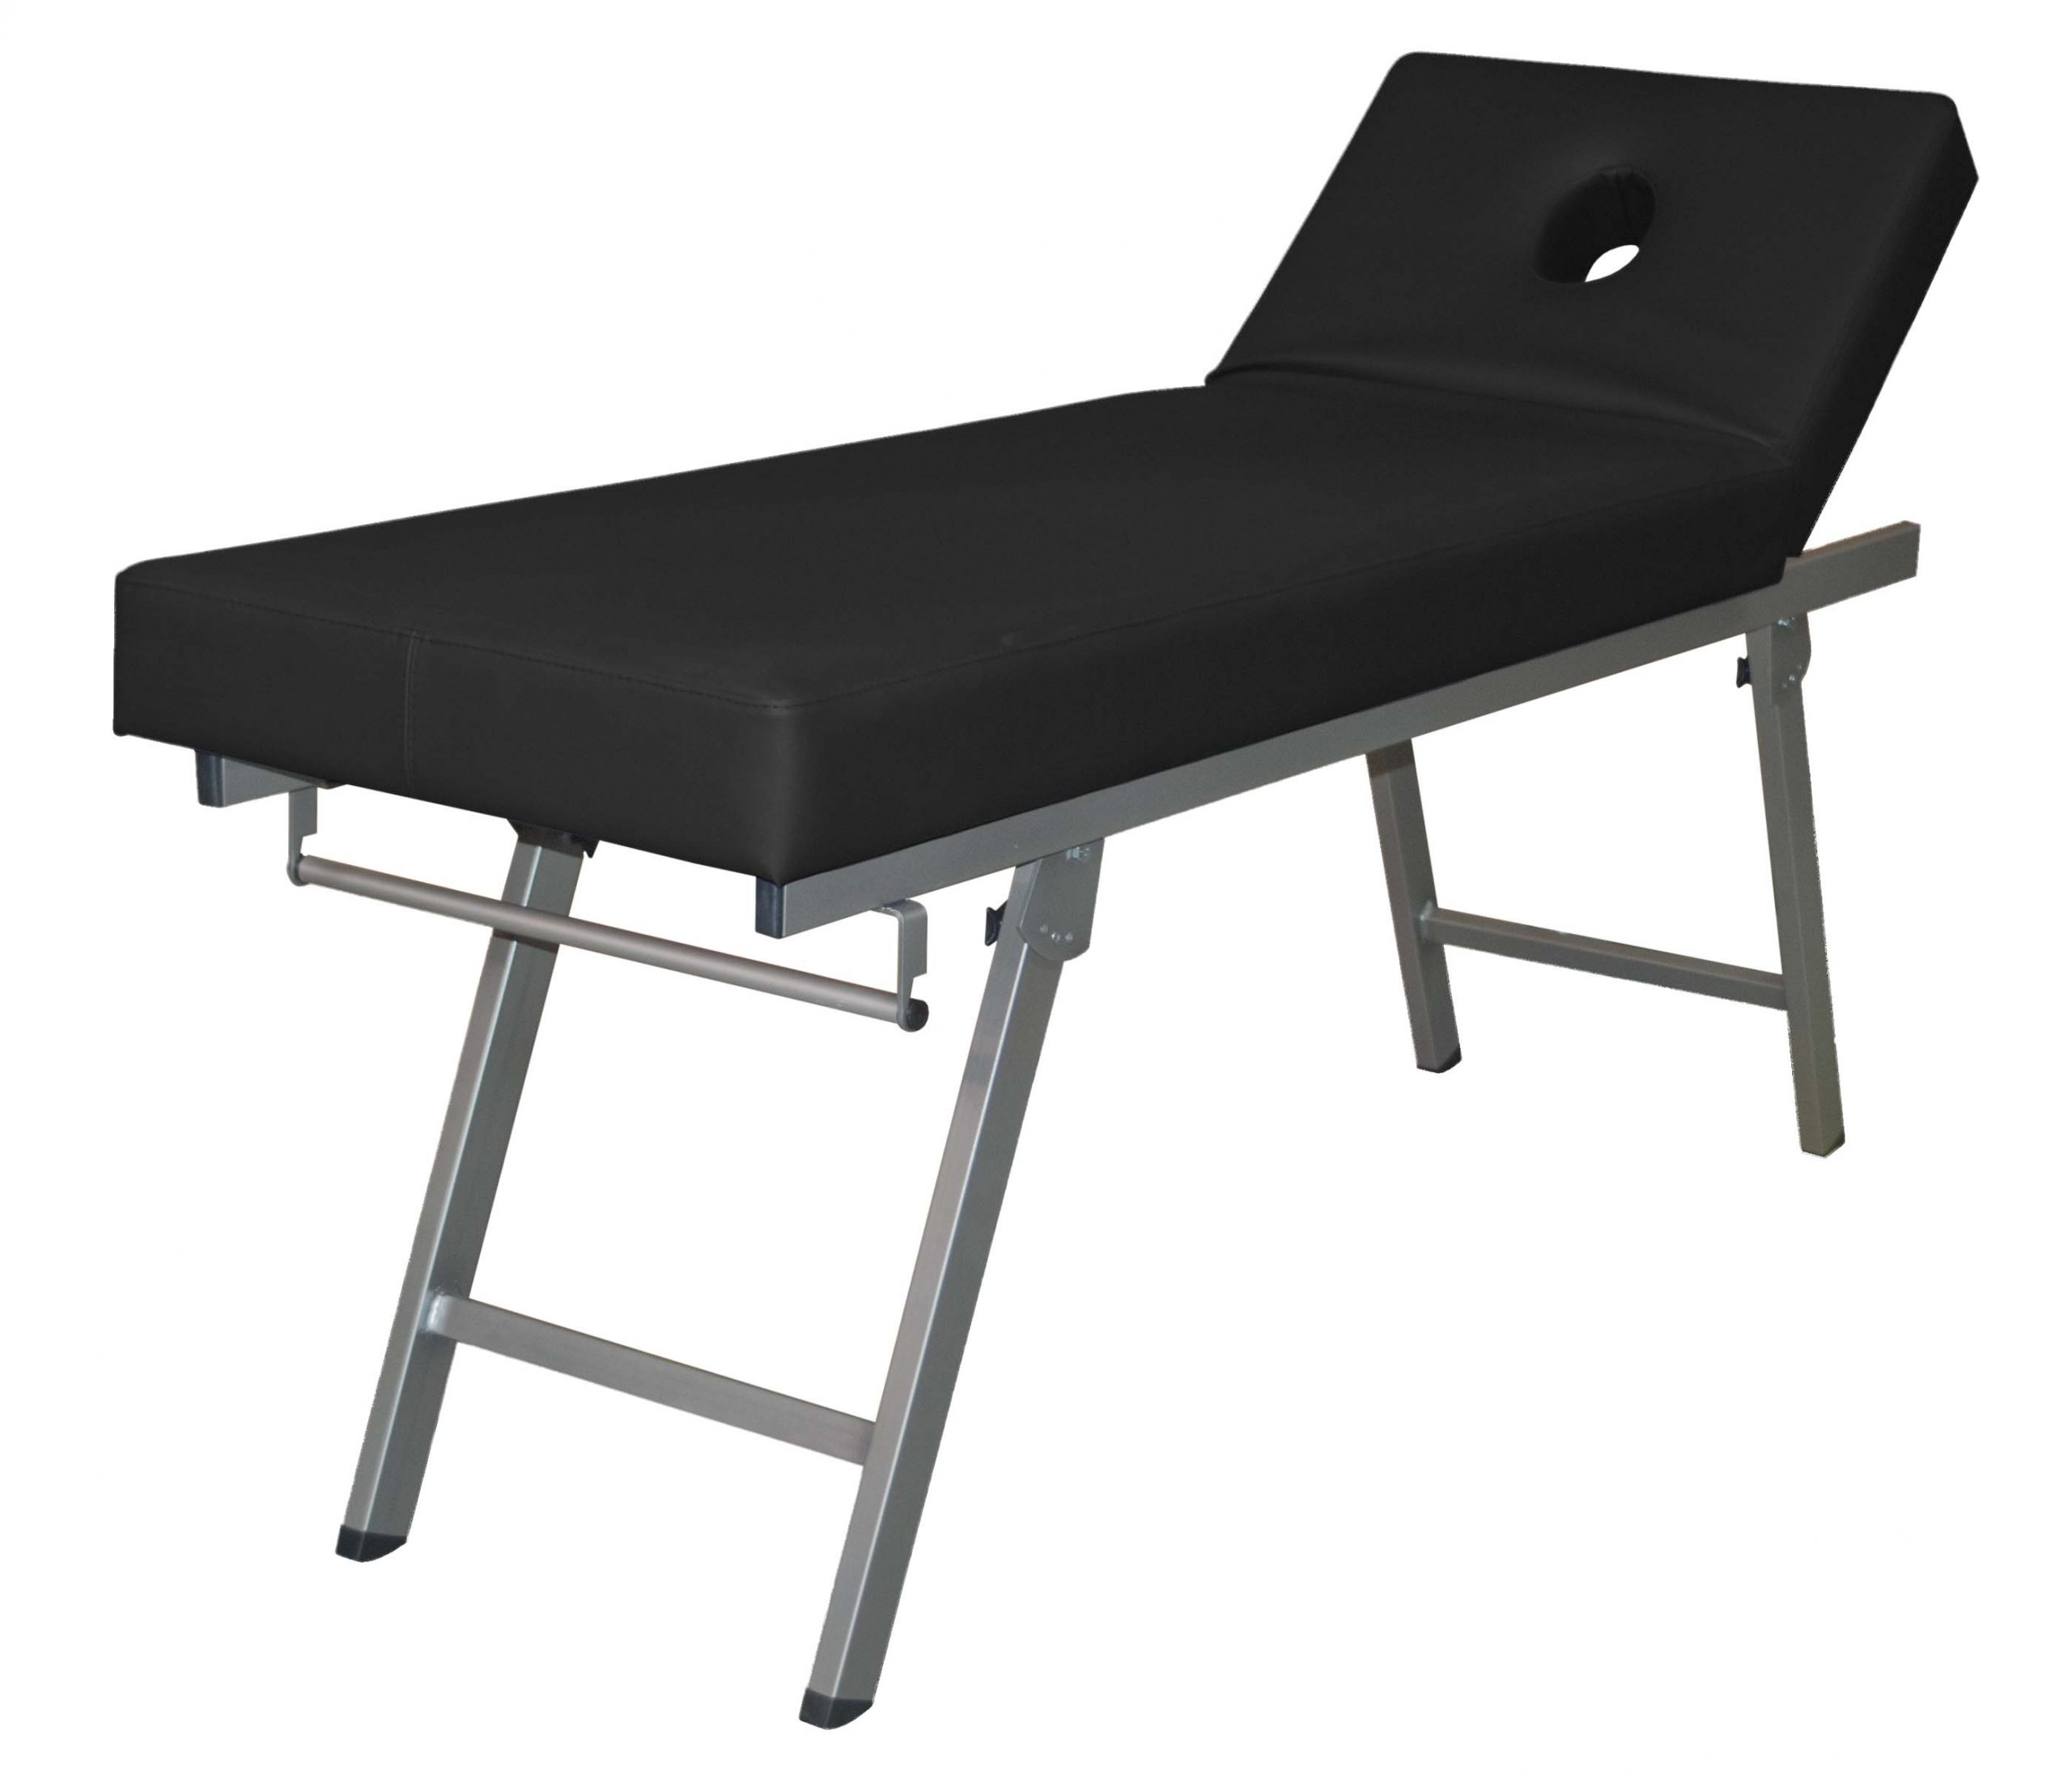 Marquesa de Observação Simples - Fisioterapia - Produtos Ortopedia